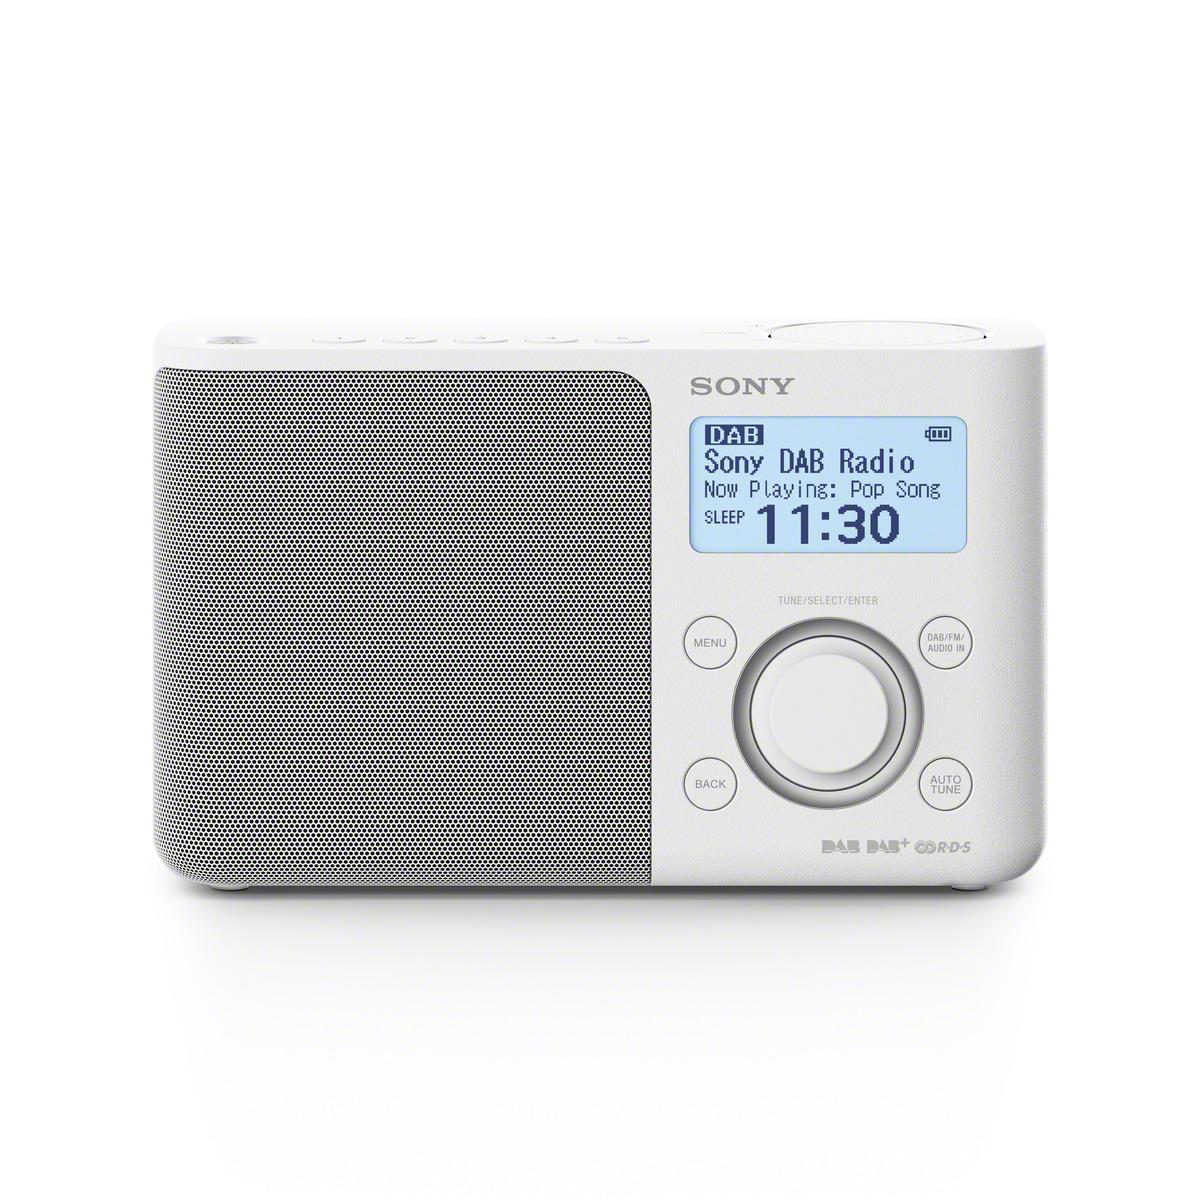 Radio portátil Sony XDRS61DW.EU8 Negro DAB/DAB+/FM · Electrónica ...